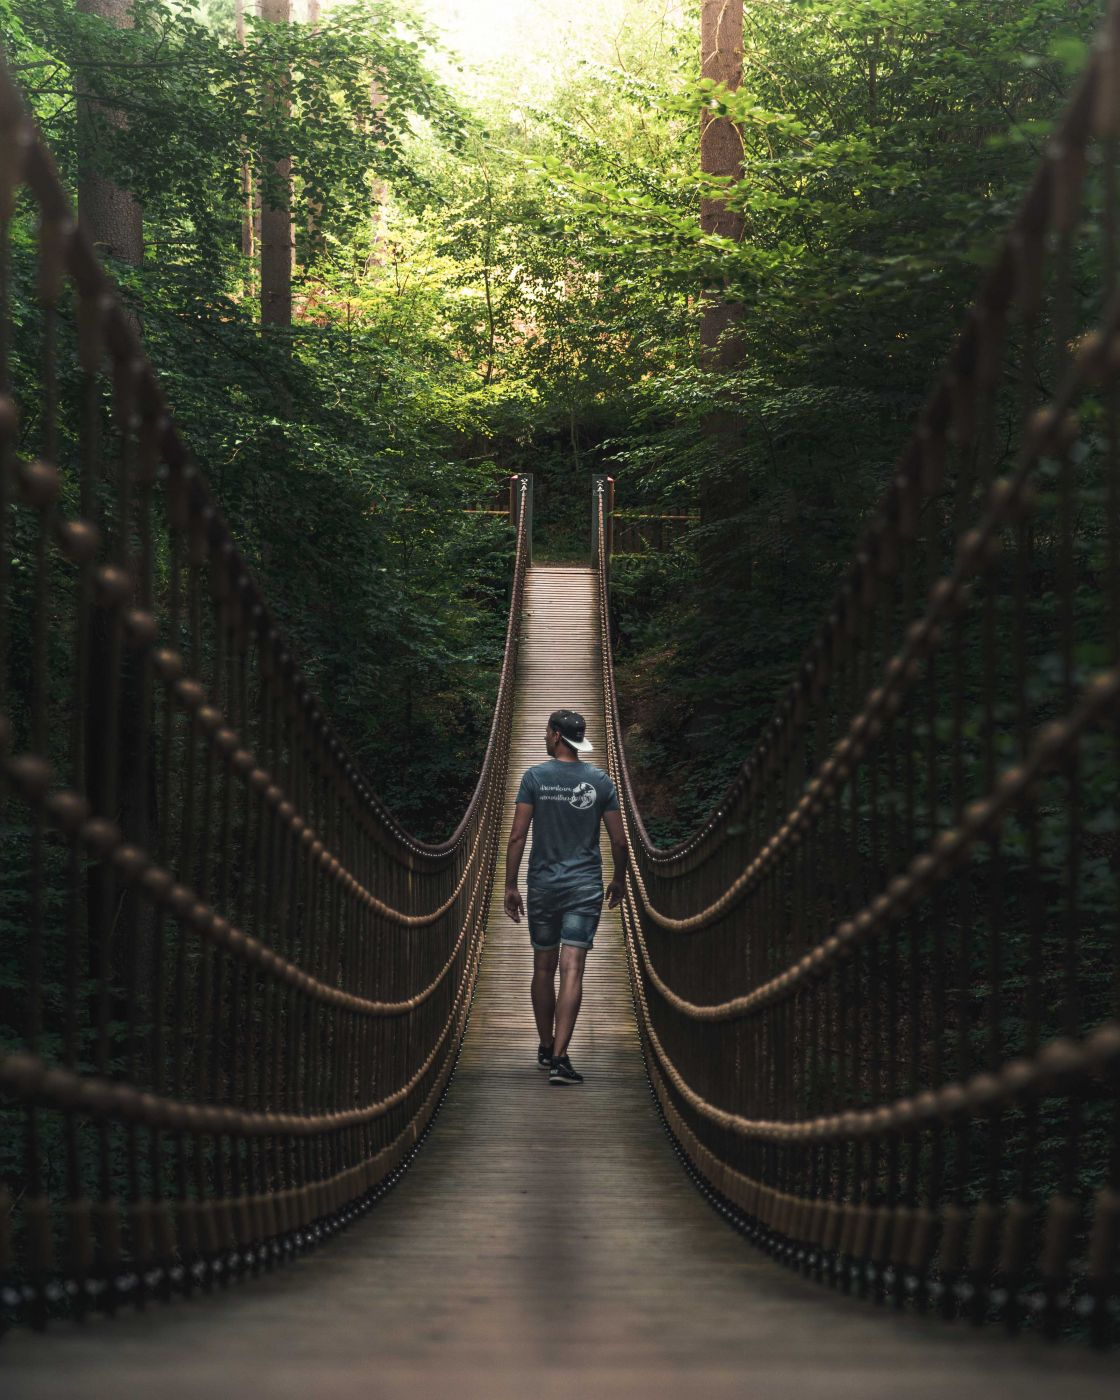 Suspension bridge in the Bingen Forest, Germany